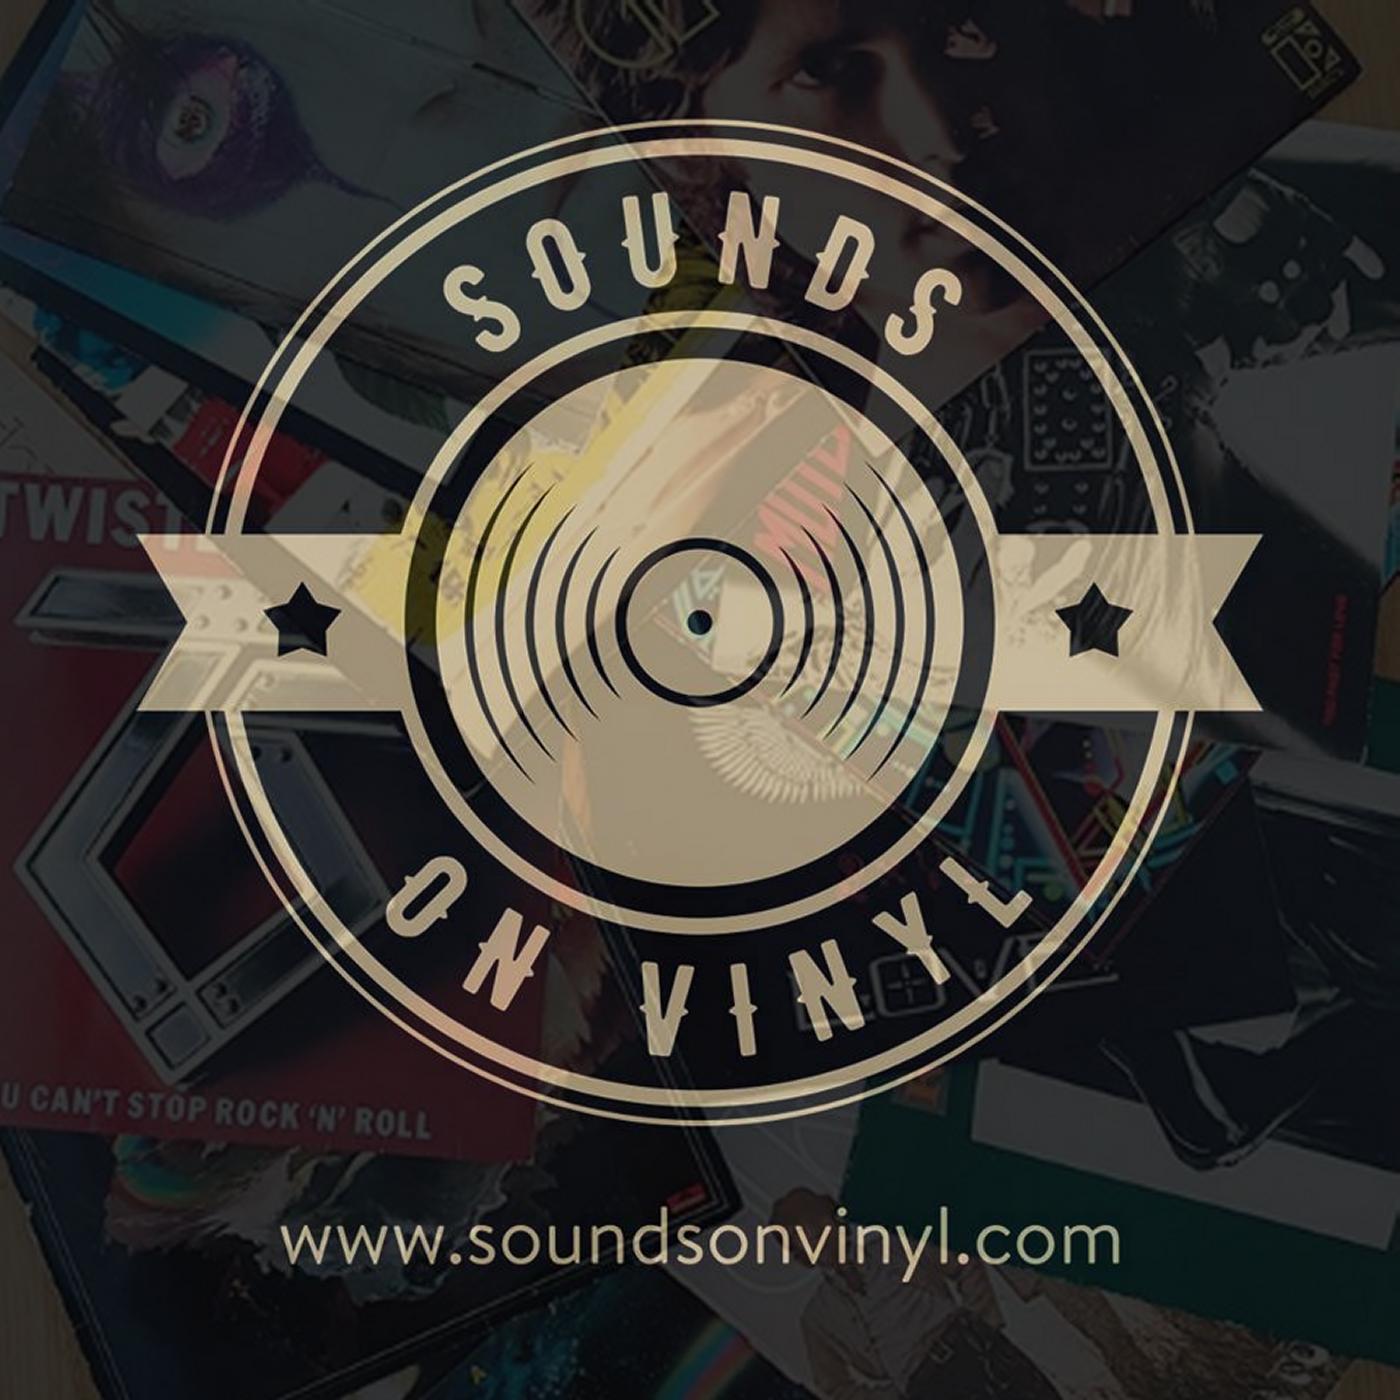 Show artwork for Sounds On Vinyl